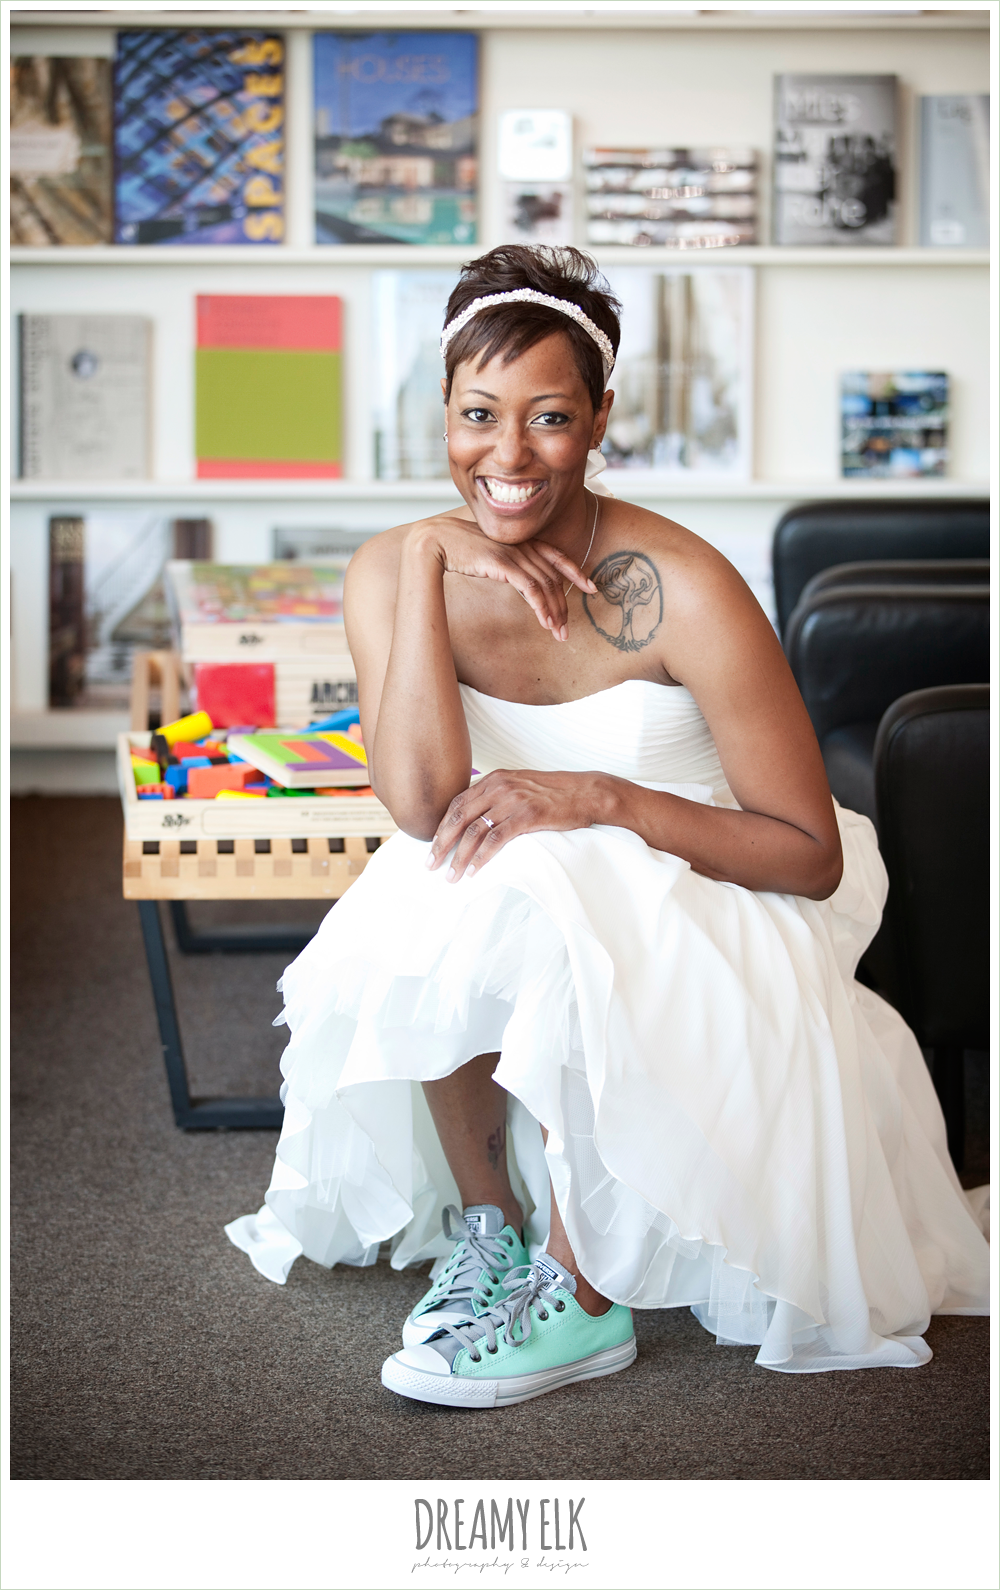 bookstore bridal photo, dreamy elk photography & design